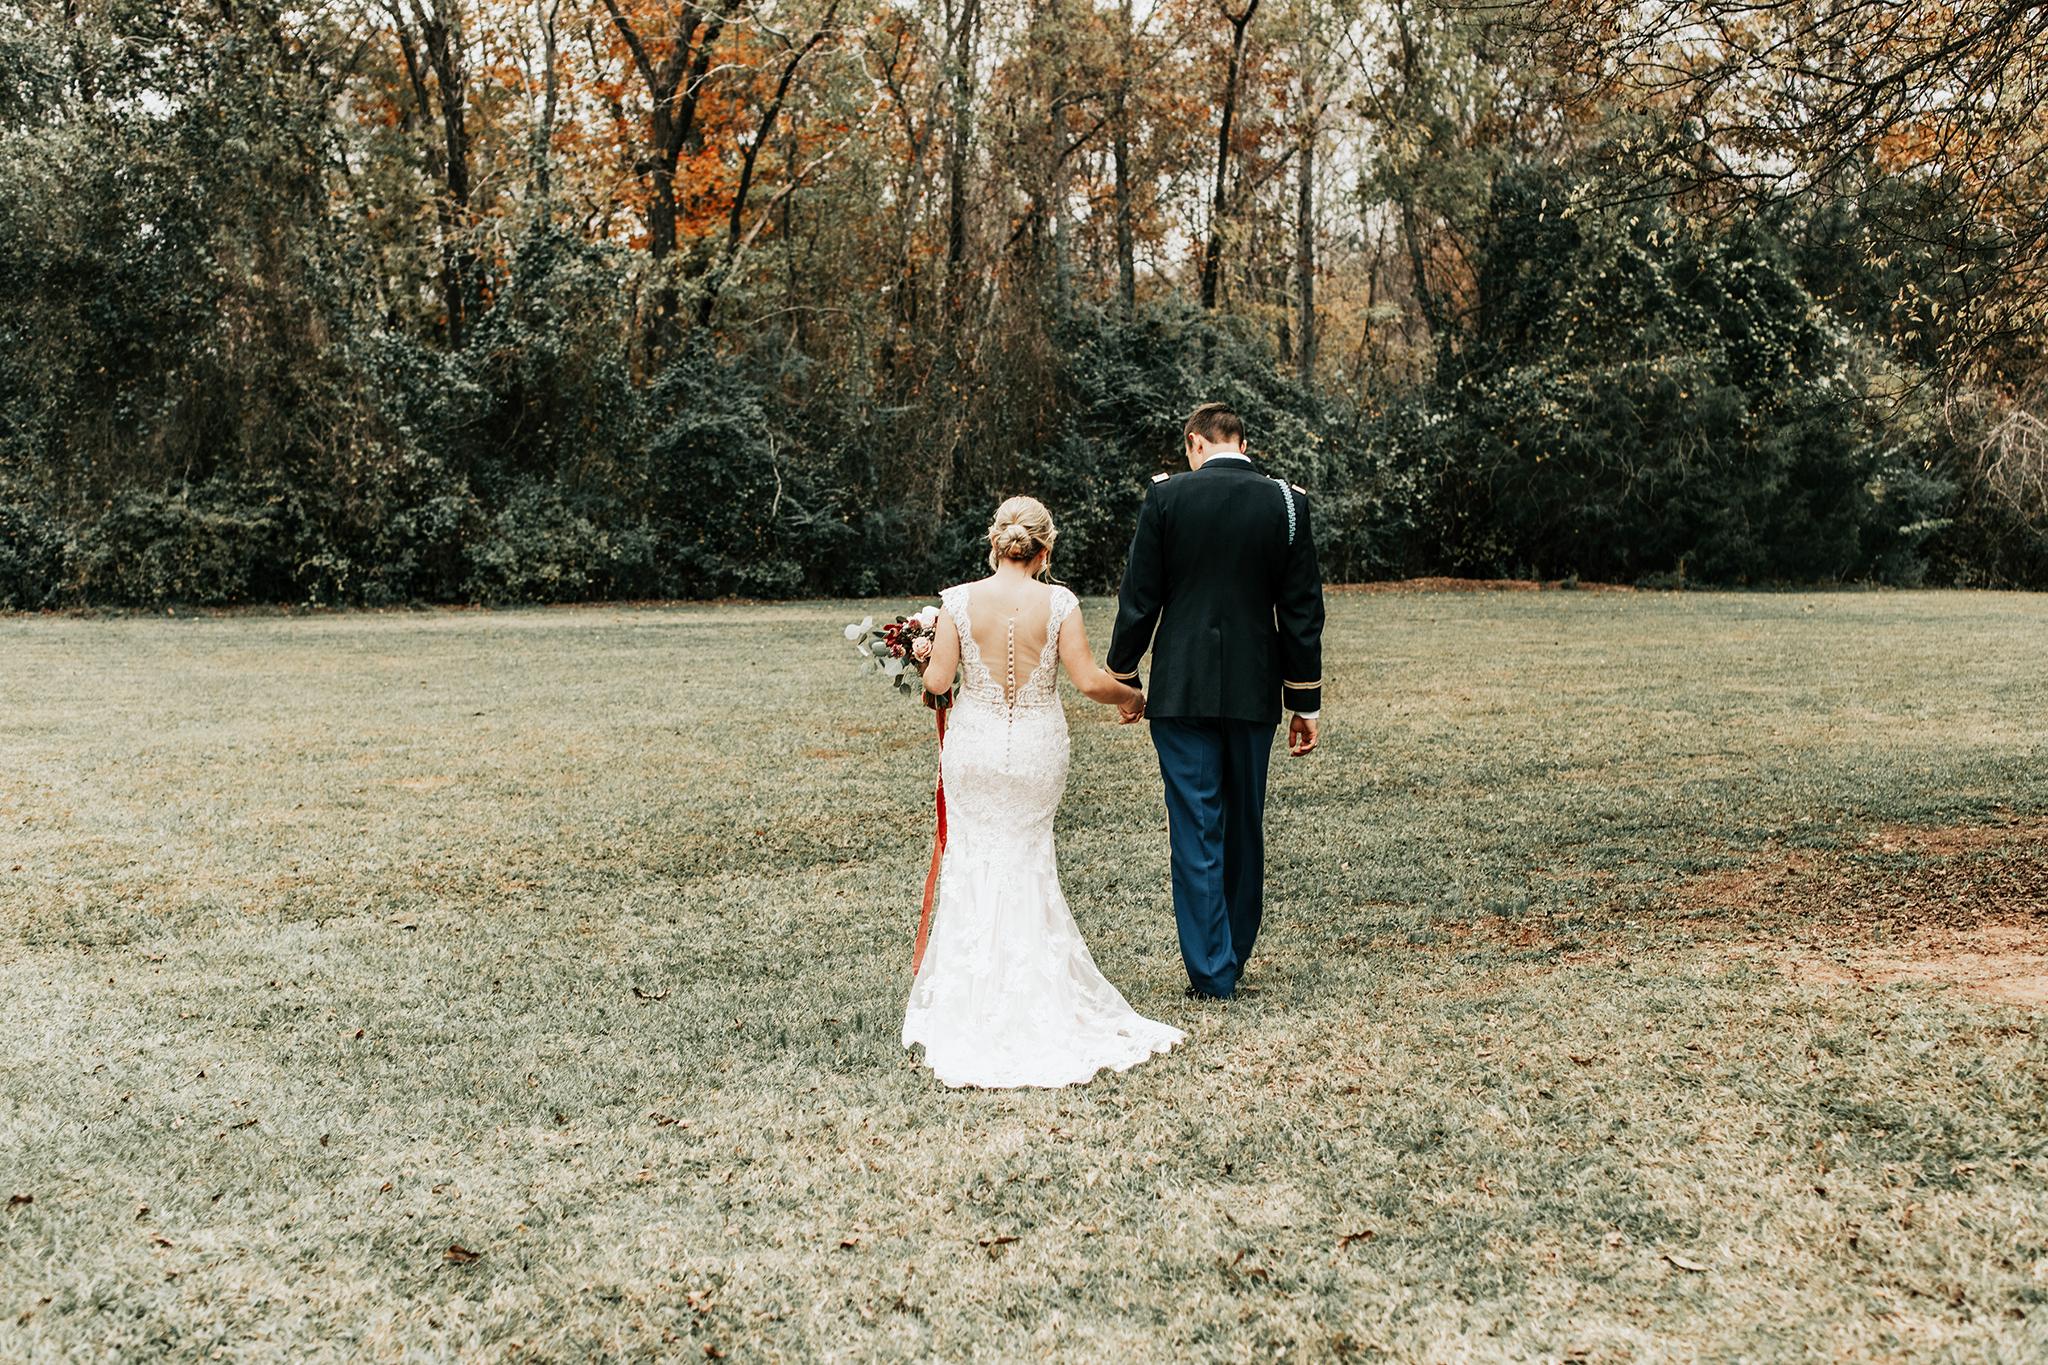 Brittany Martorella Photography - Hoody Hudson Farm, Cataula - Winter Wedding - Columbus, Georgia